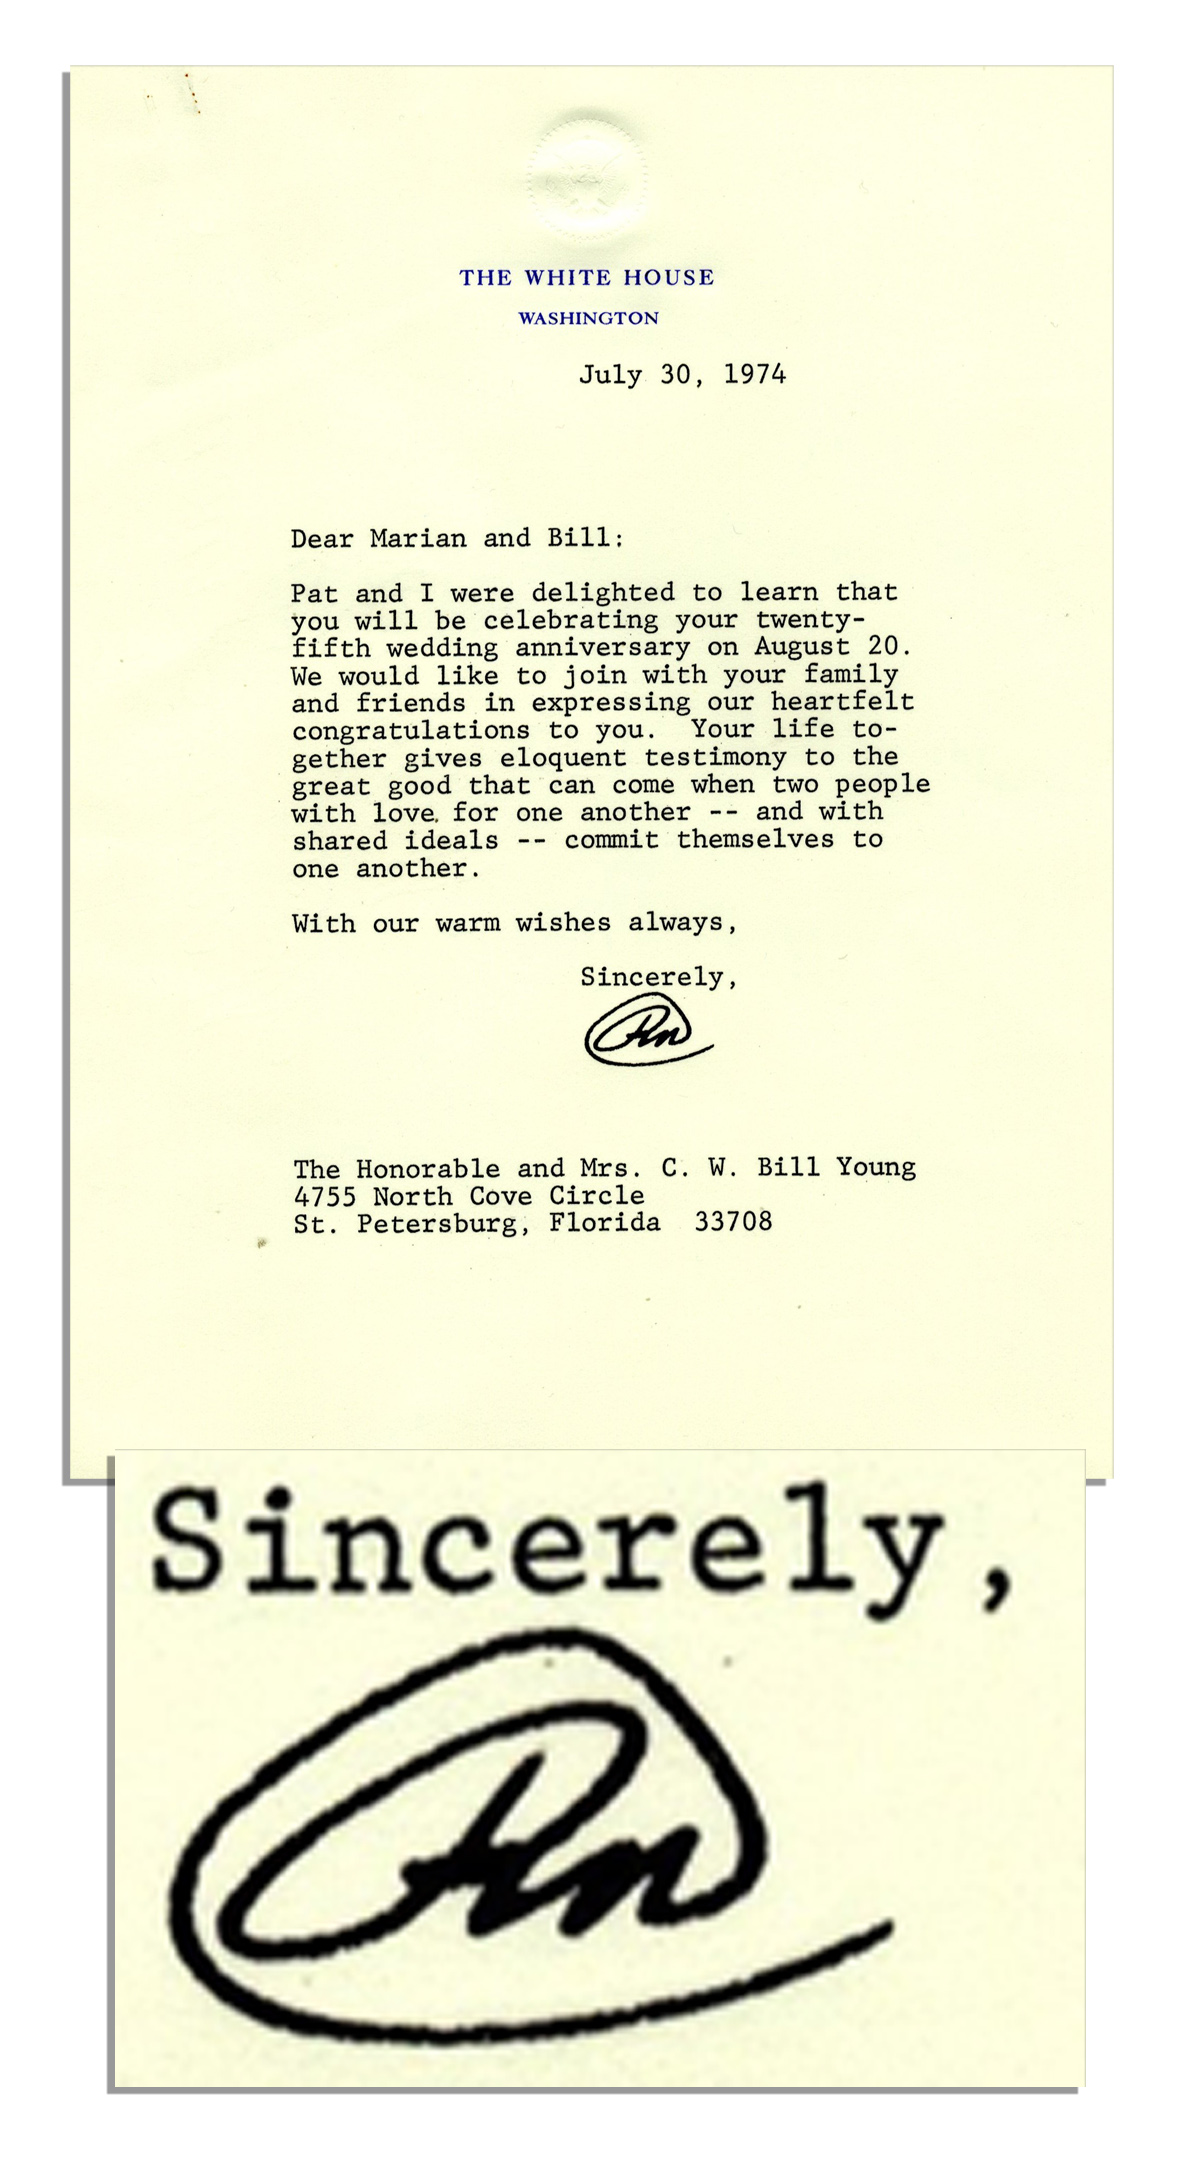 Richard Nixon Resignation Letter Heartpulsar